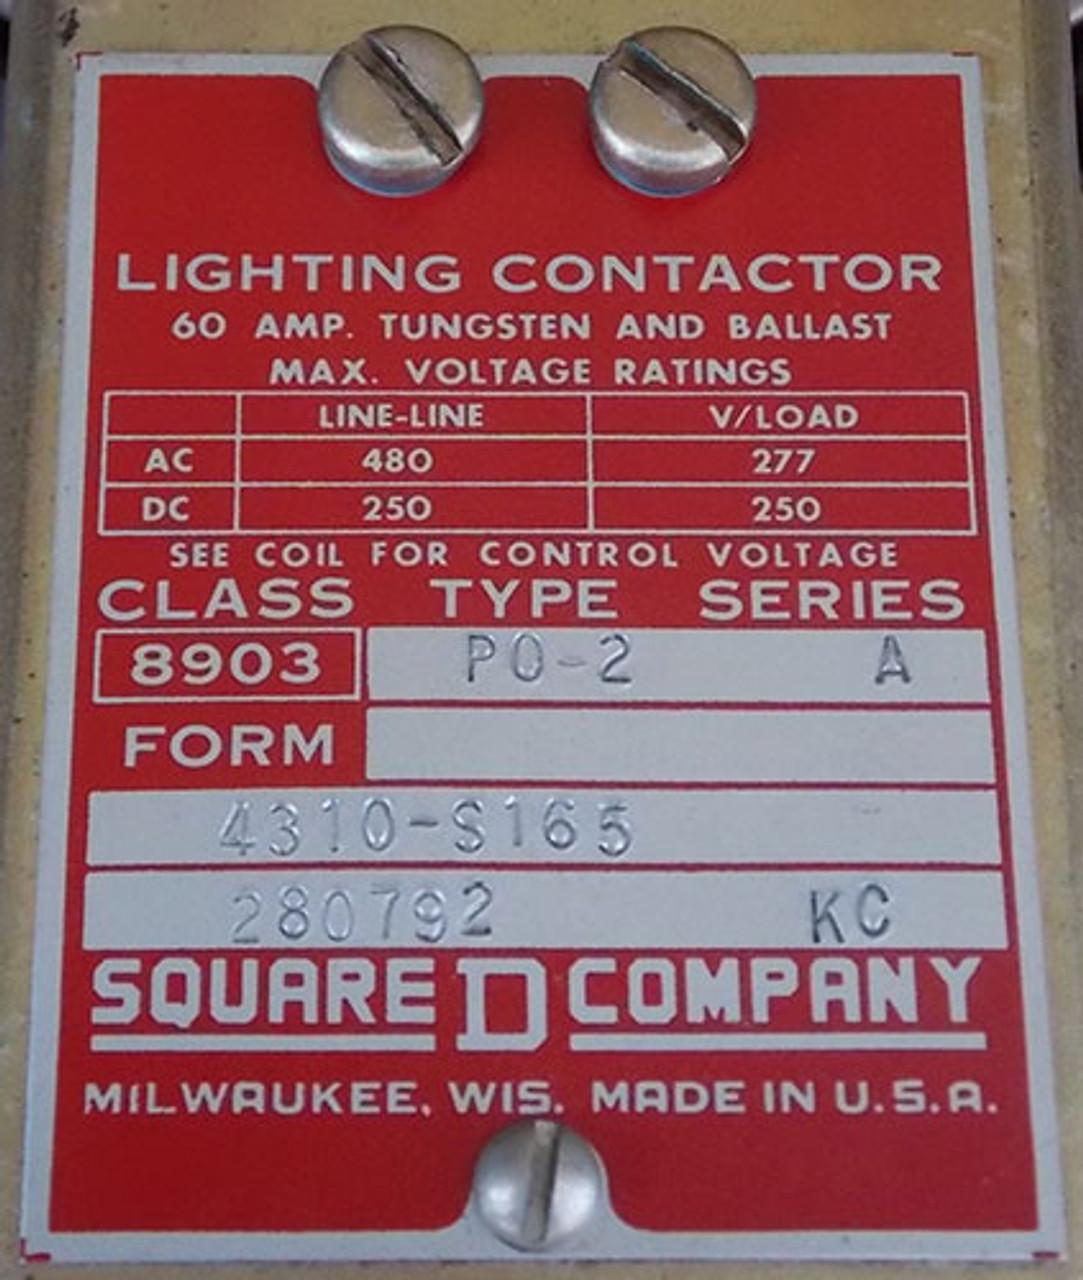 Square D 8903 PO-2 3P 60 Amp 480V 120V Coil Lighting Contactor - Used